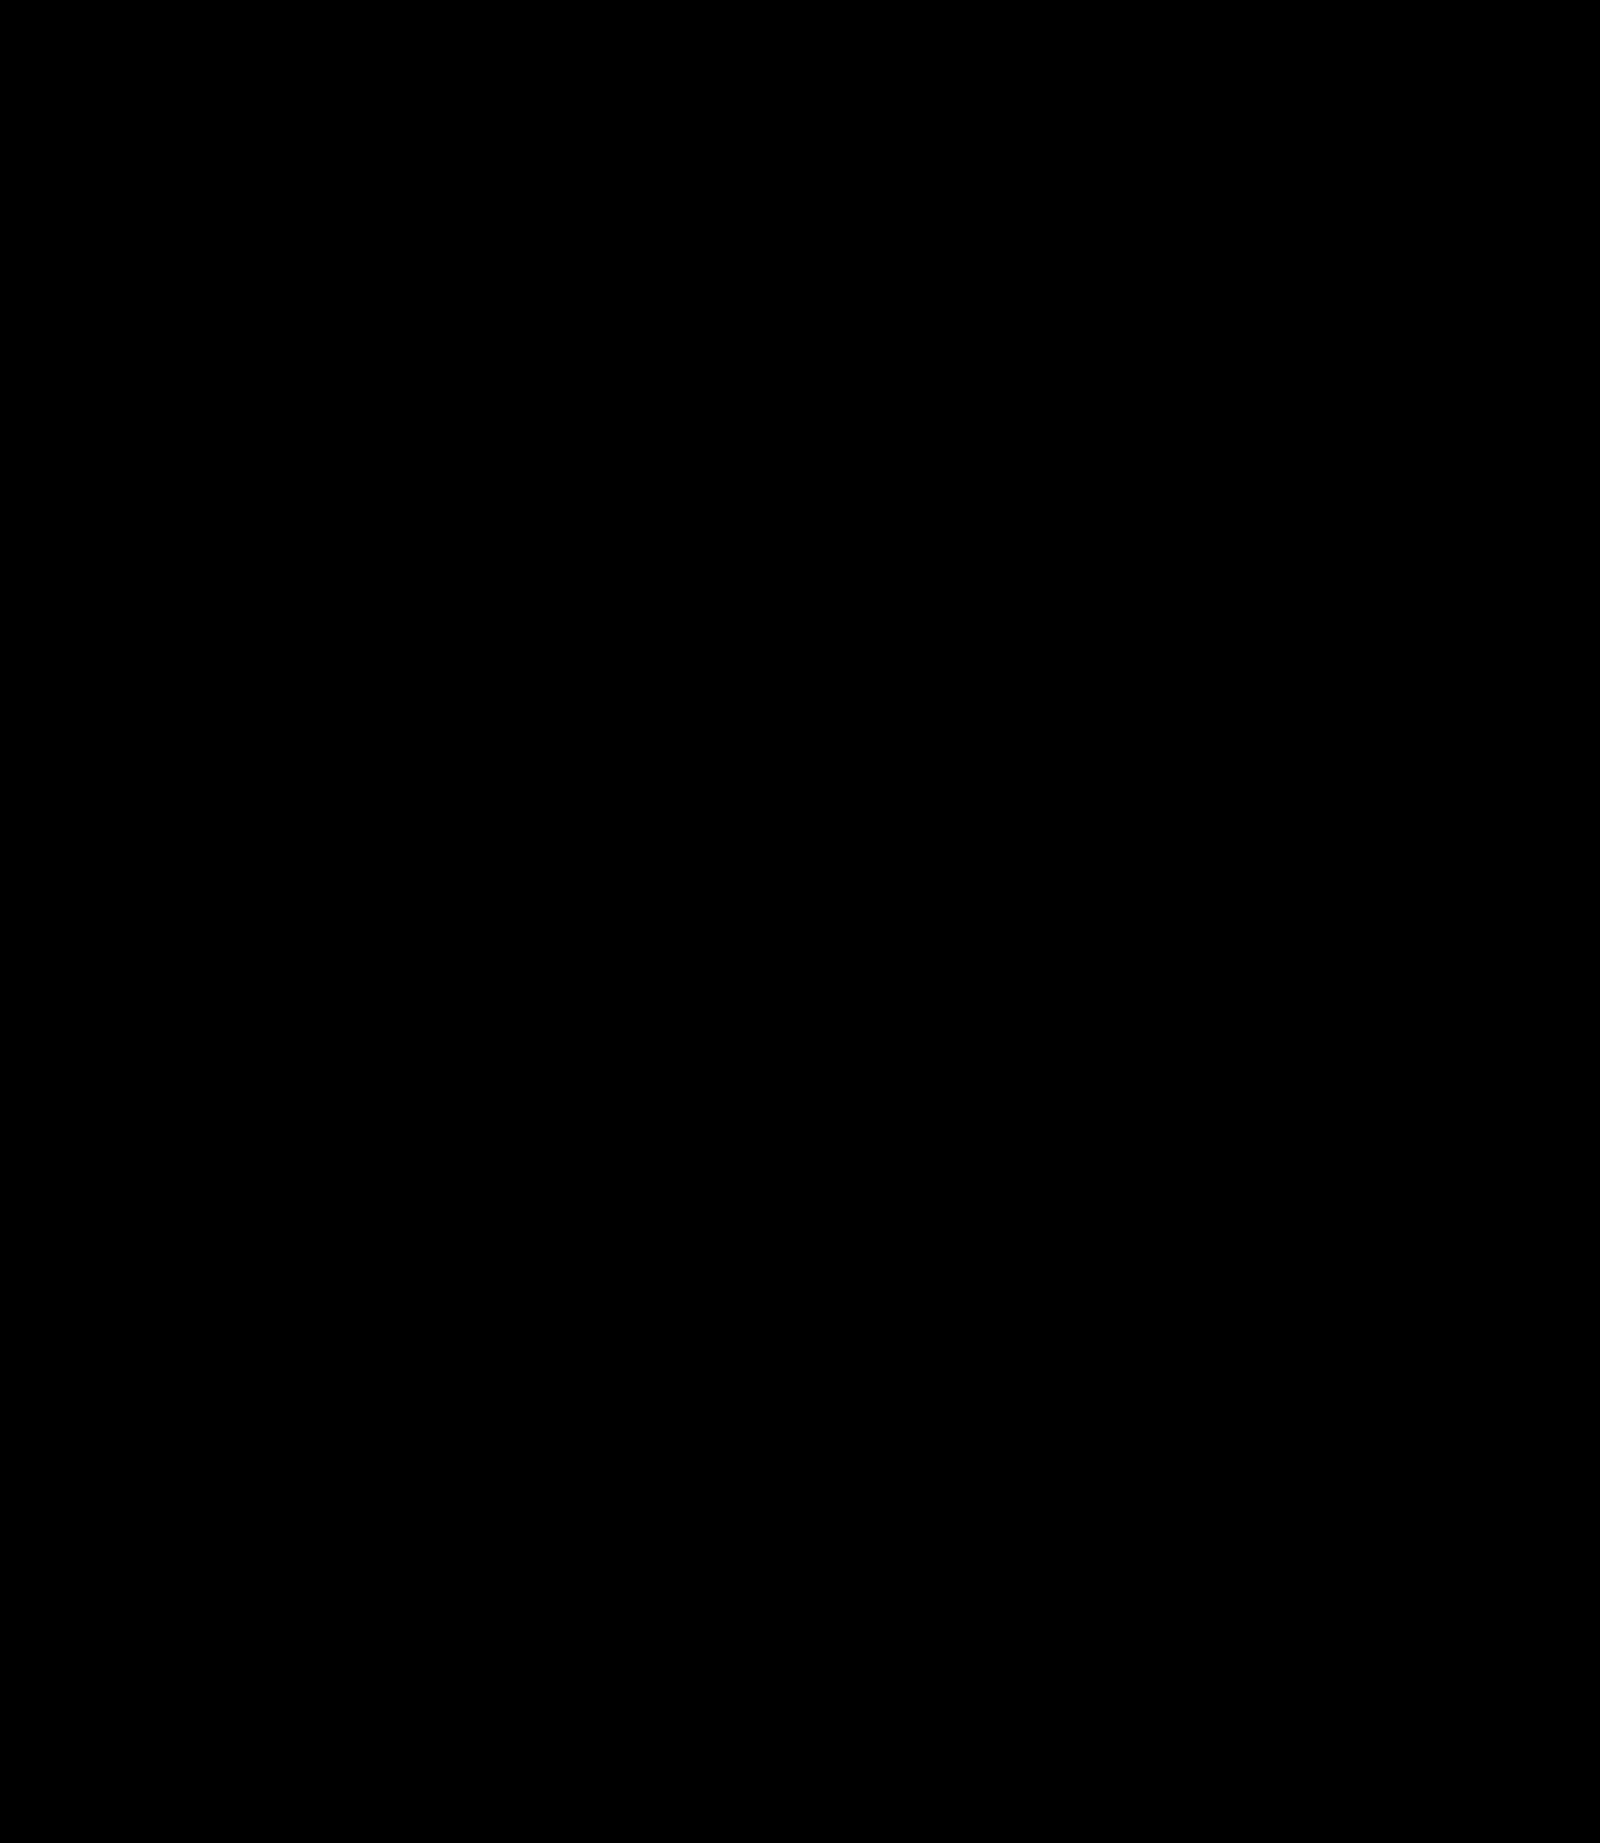 collection of green. Hornet clipart logo